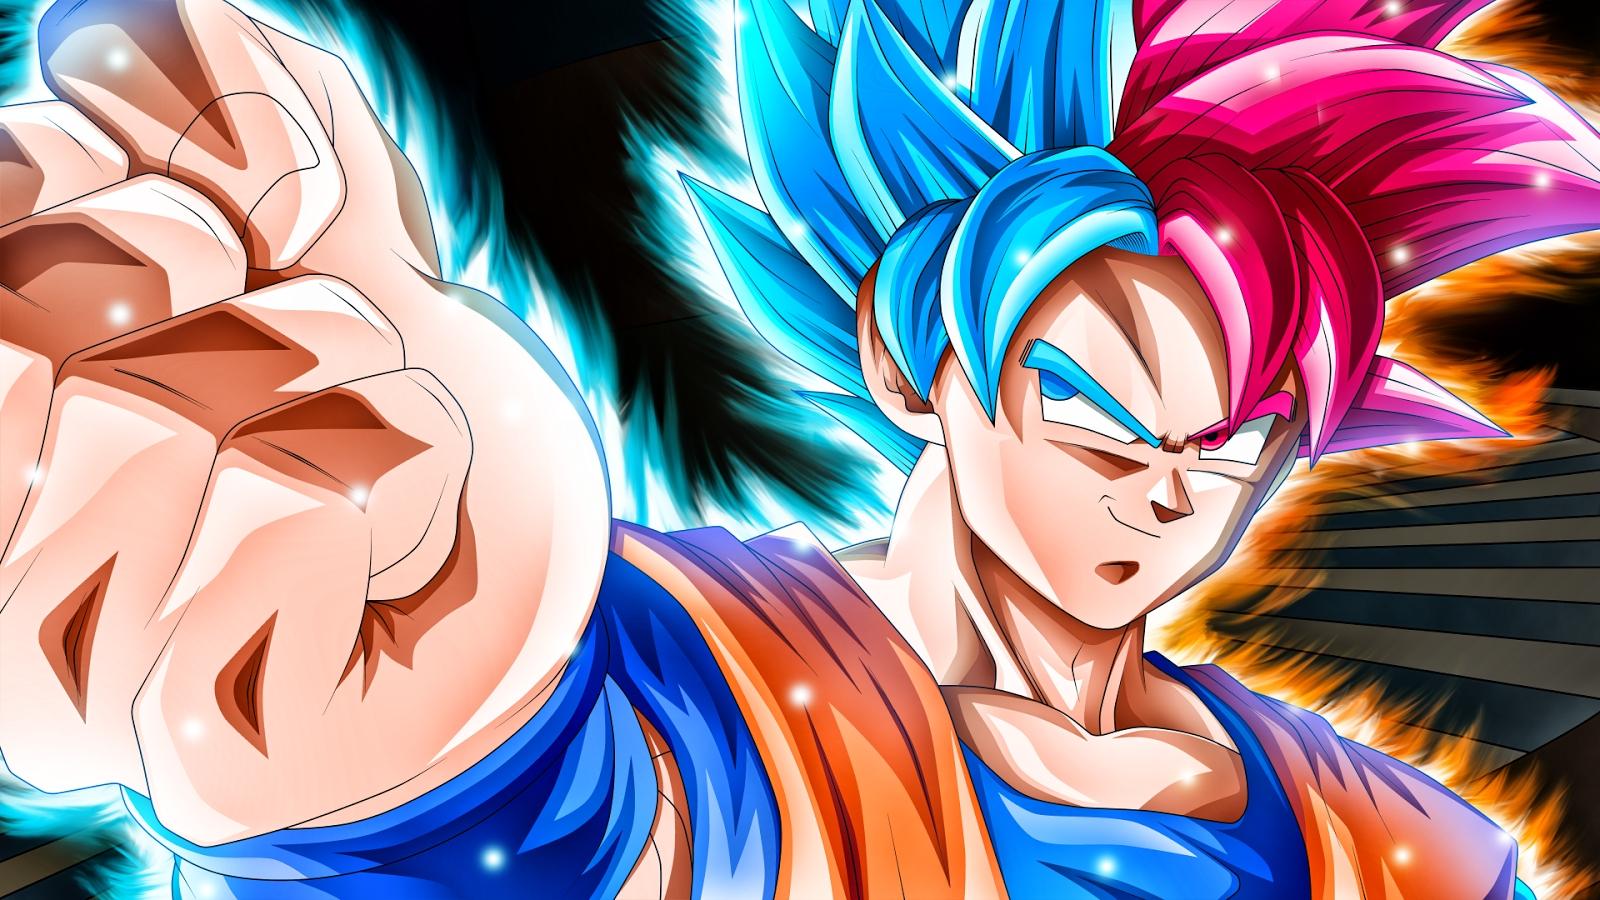 son goku super saiyan god and super saiyan blue wallpaper hd for